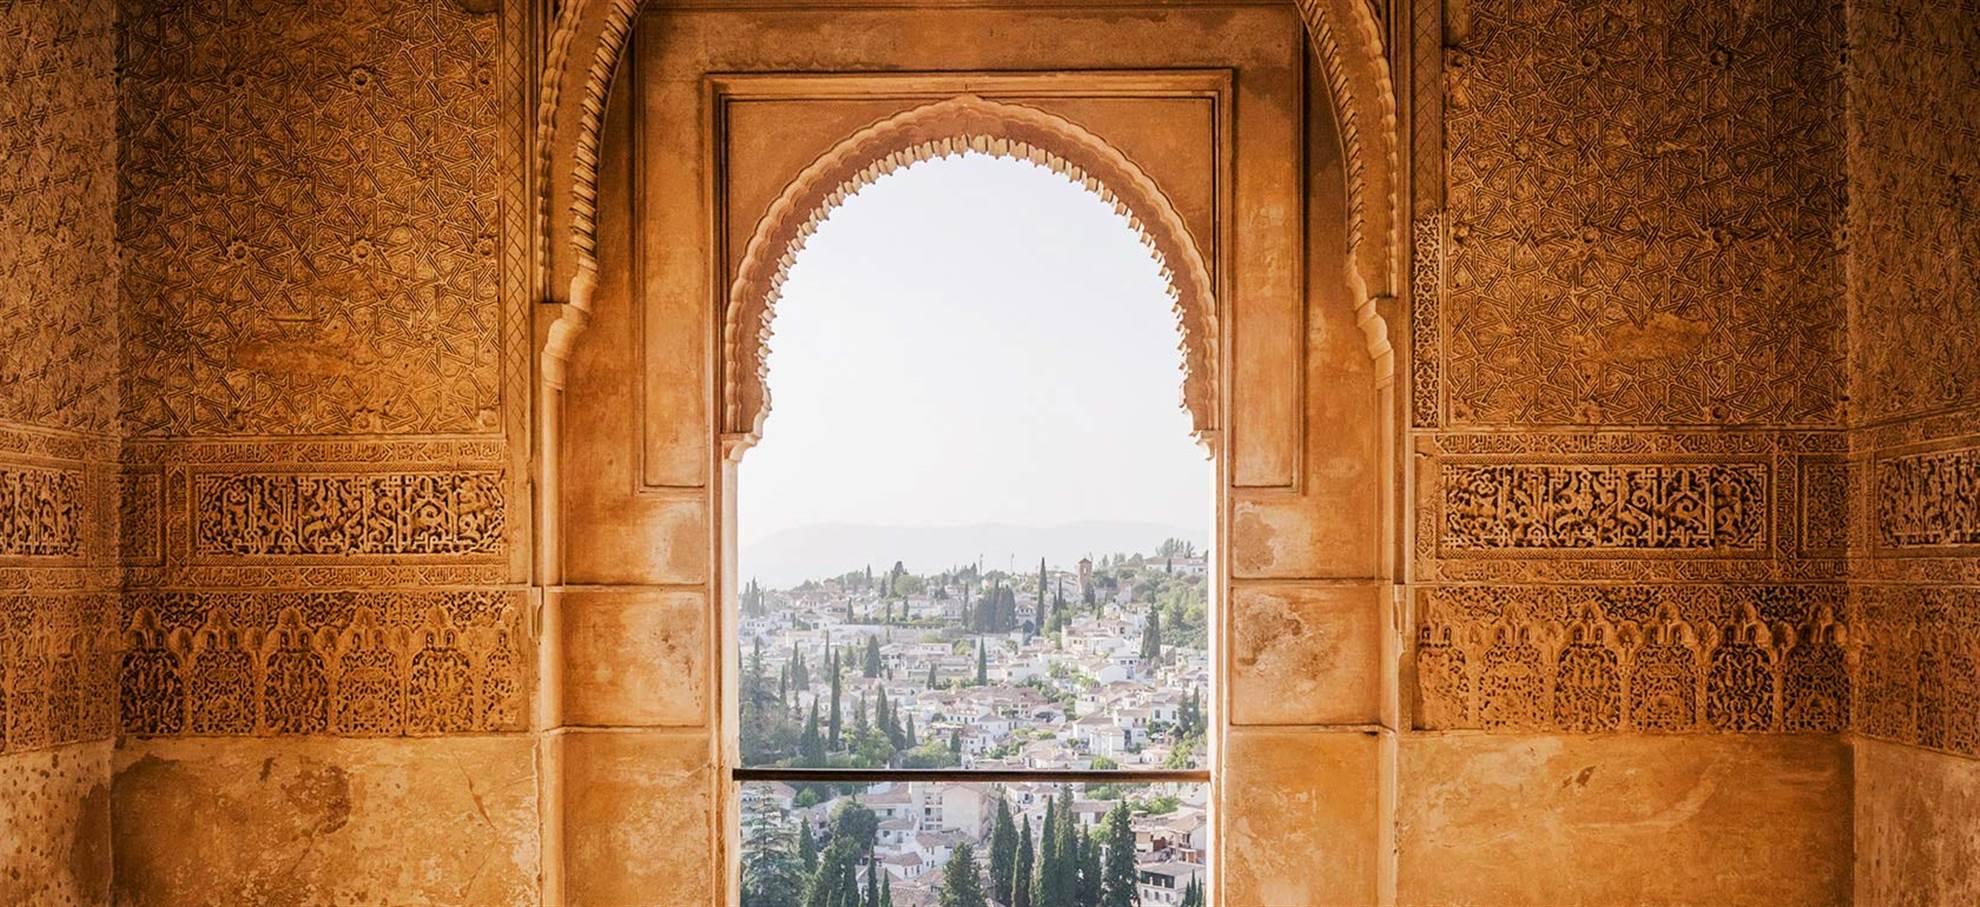 Alhambra Card - Ochtendbezoek (8.30 uur) - Fast Track!